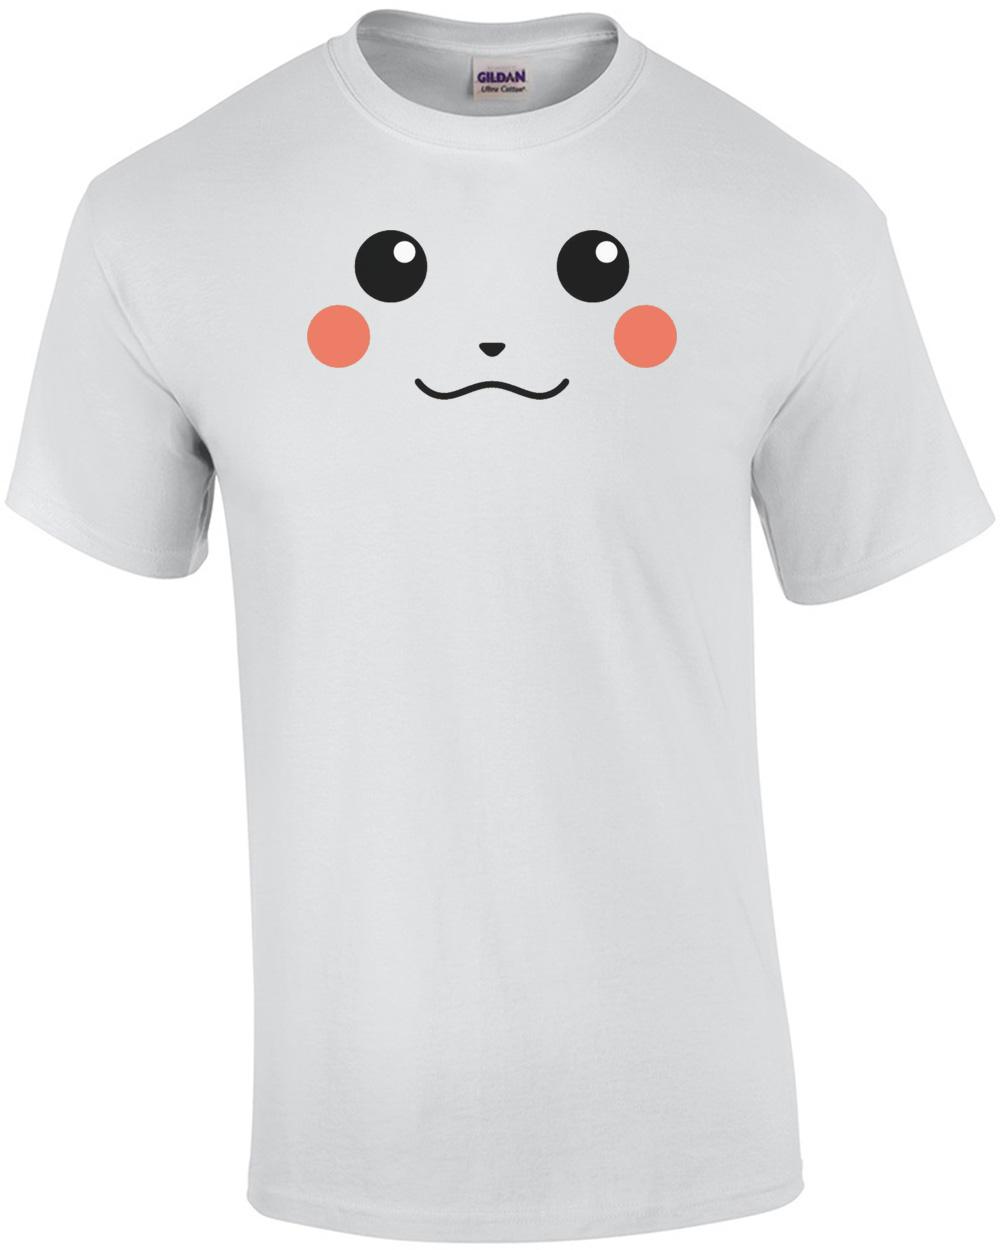 Pikachu Pokemon Shirt